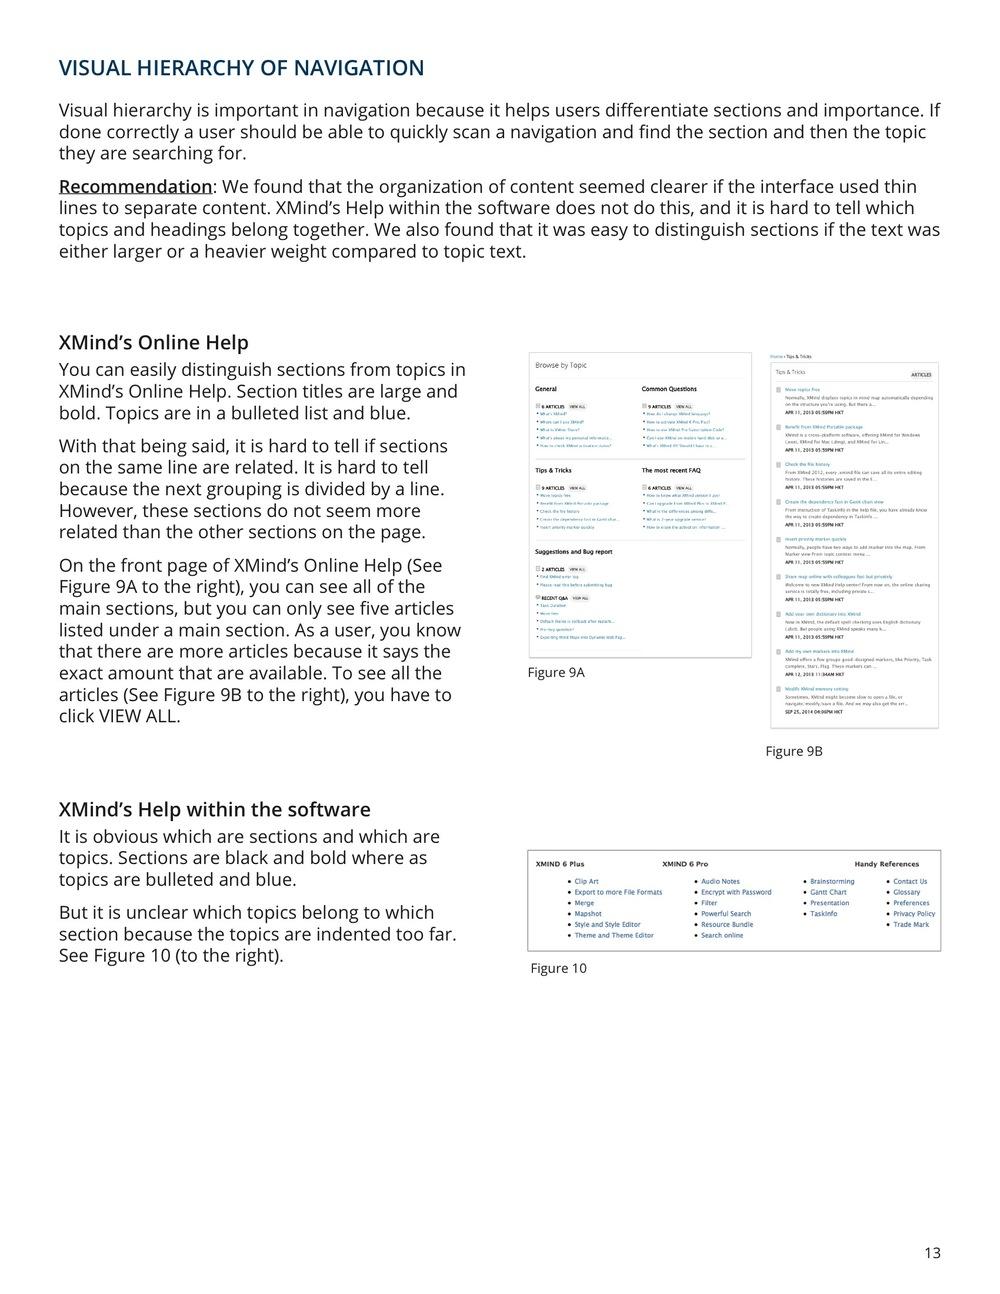 XMind Final Report_4-23-15 13-13.jpeg